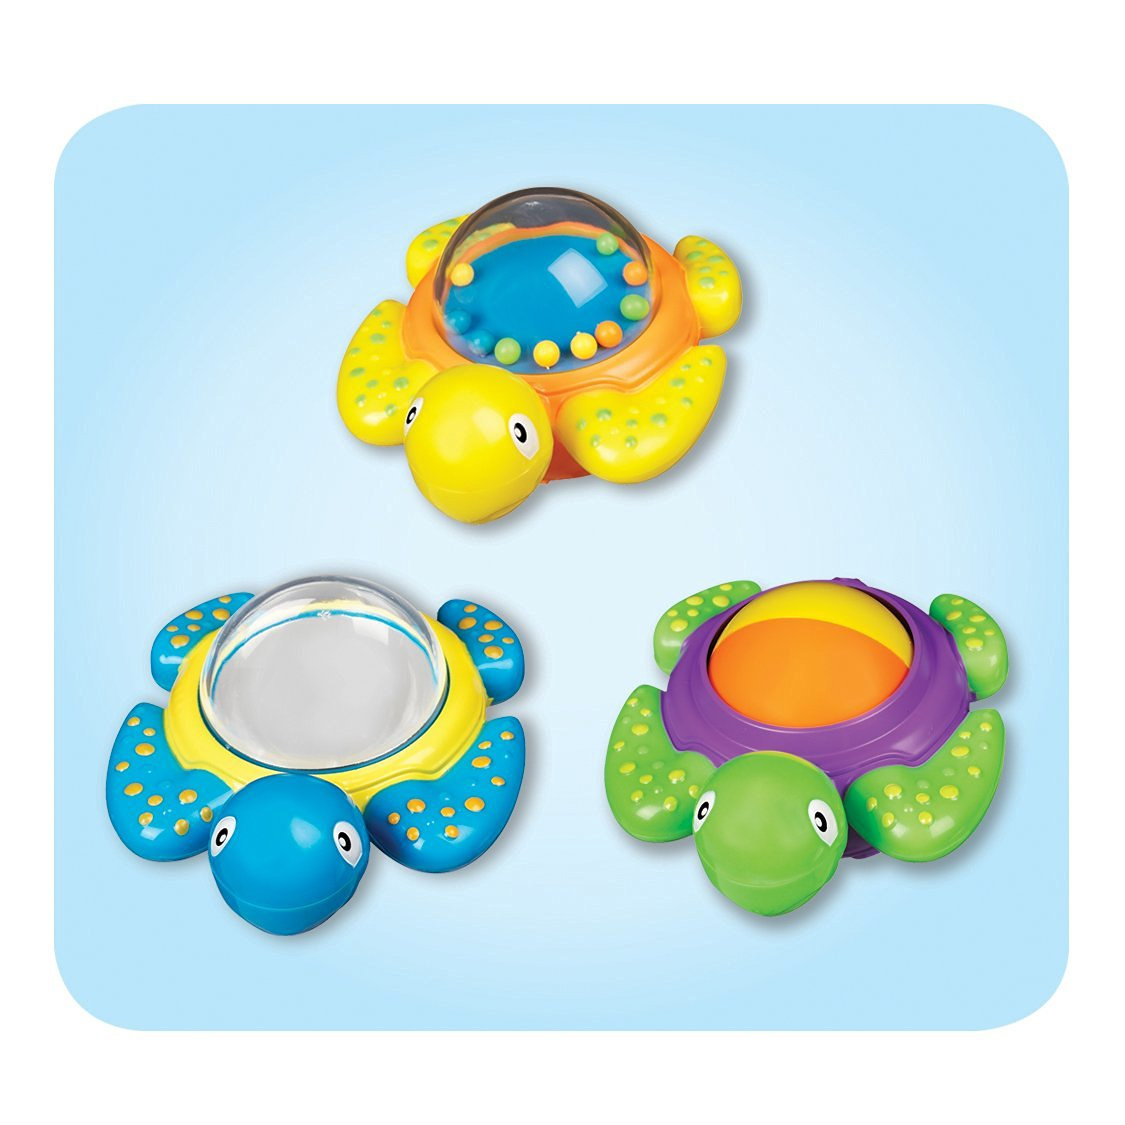 Buy Munchkin Baby Bath Toy, Turtles Baby Bath Toy Baby Fun Play ...